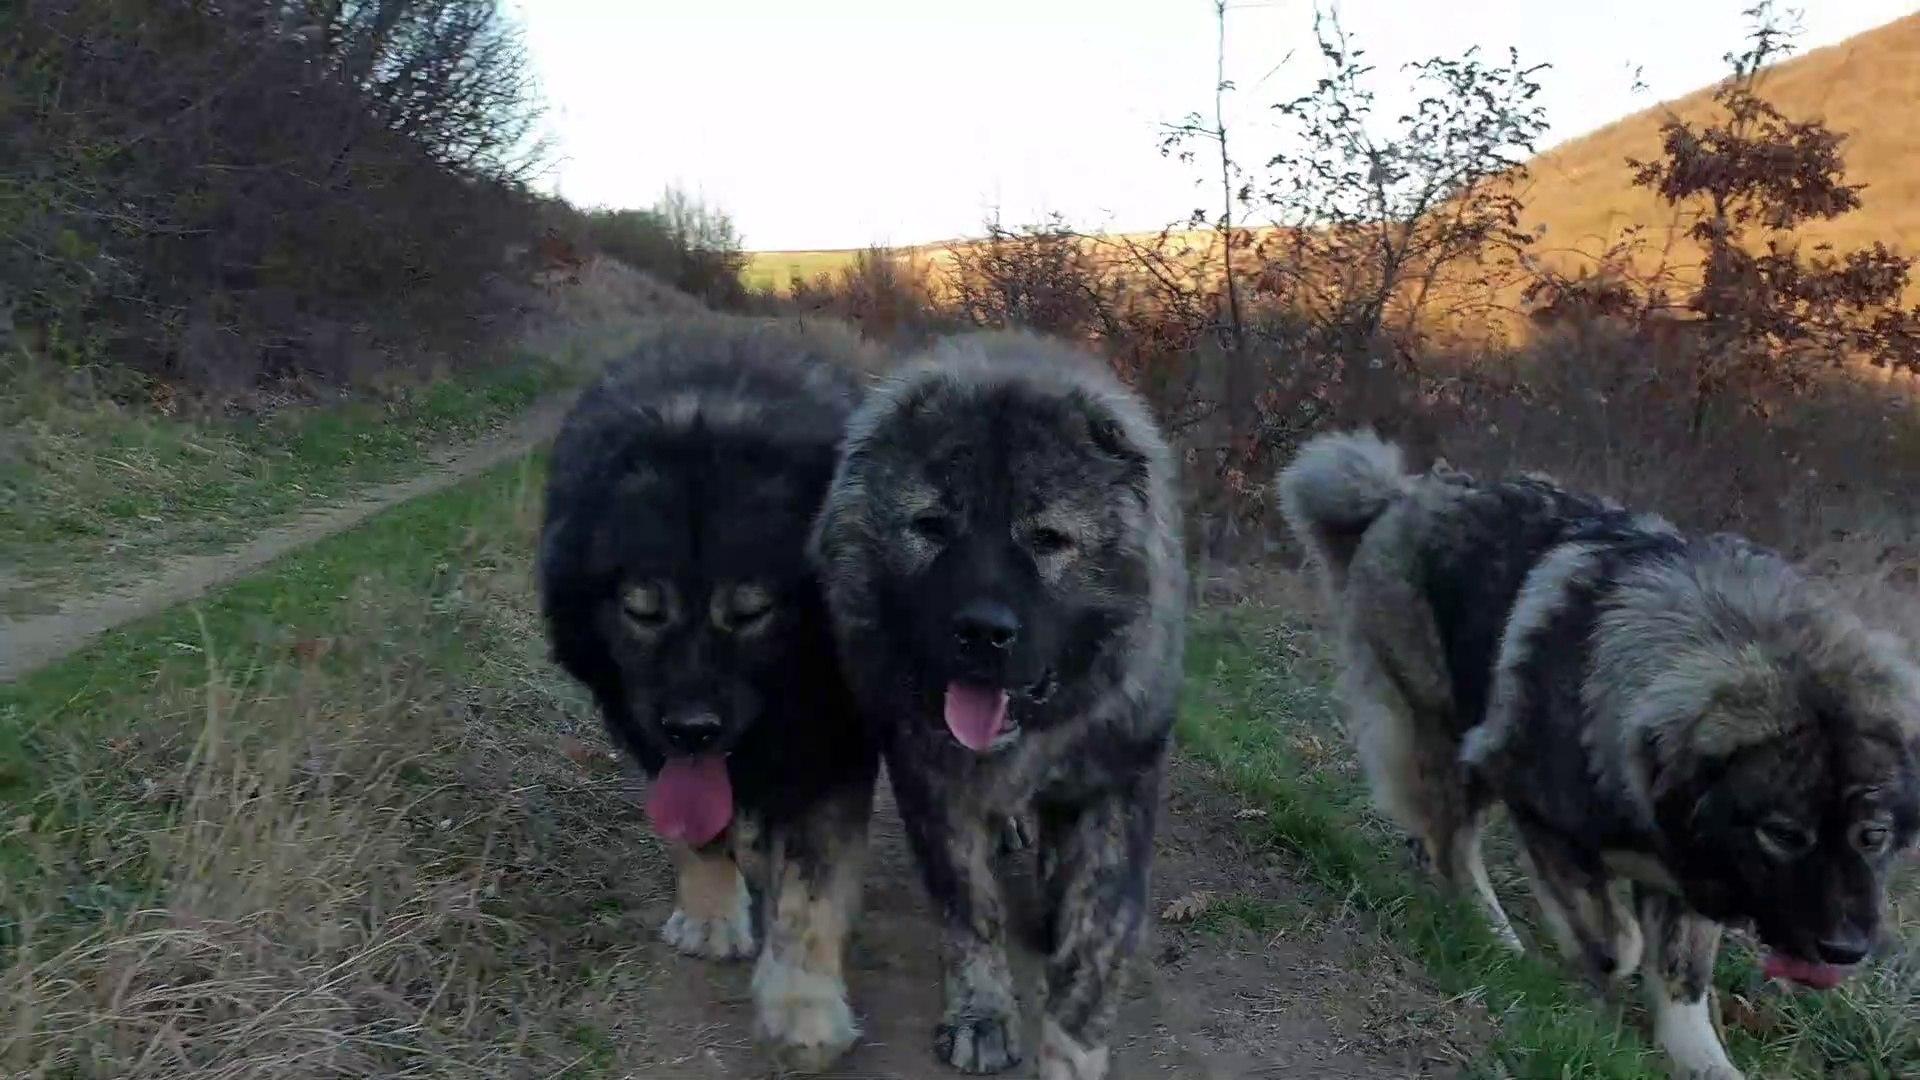 3 SiLAHSOR KAFKAS COBAN KOPEKLERi -THREE MUSKETEERS CAUCASiAN SHEPHERD DOGS